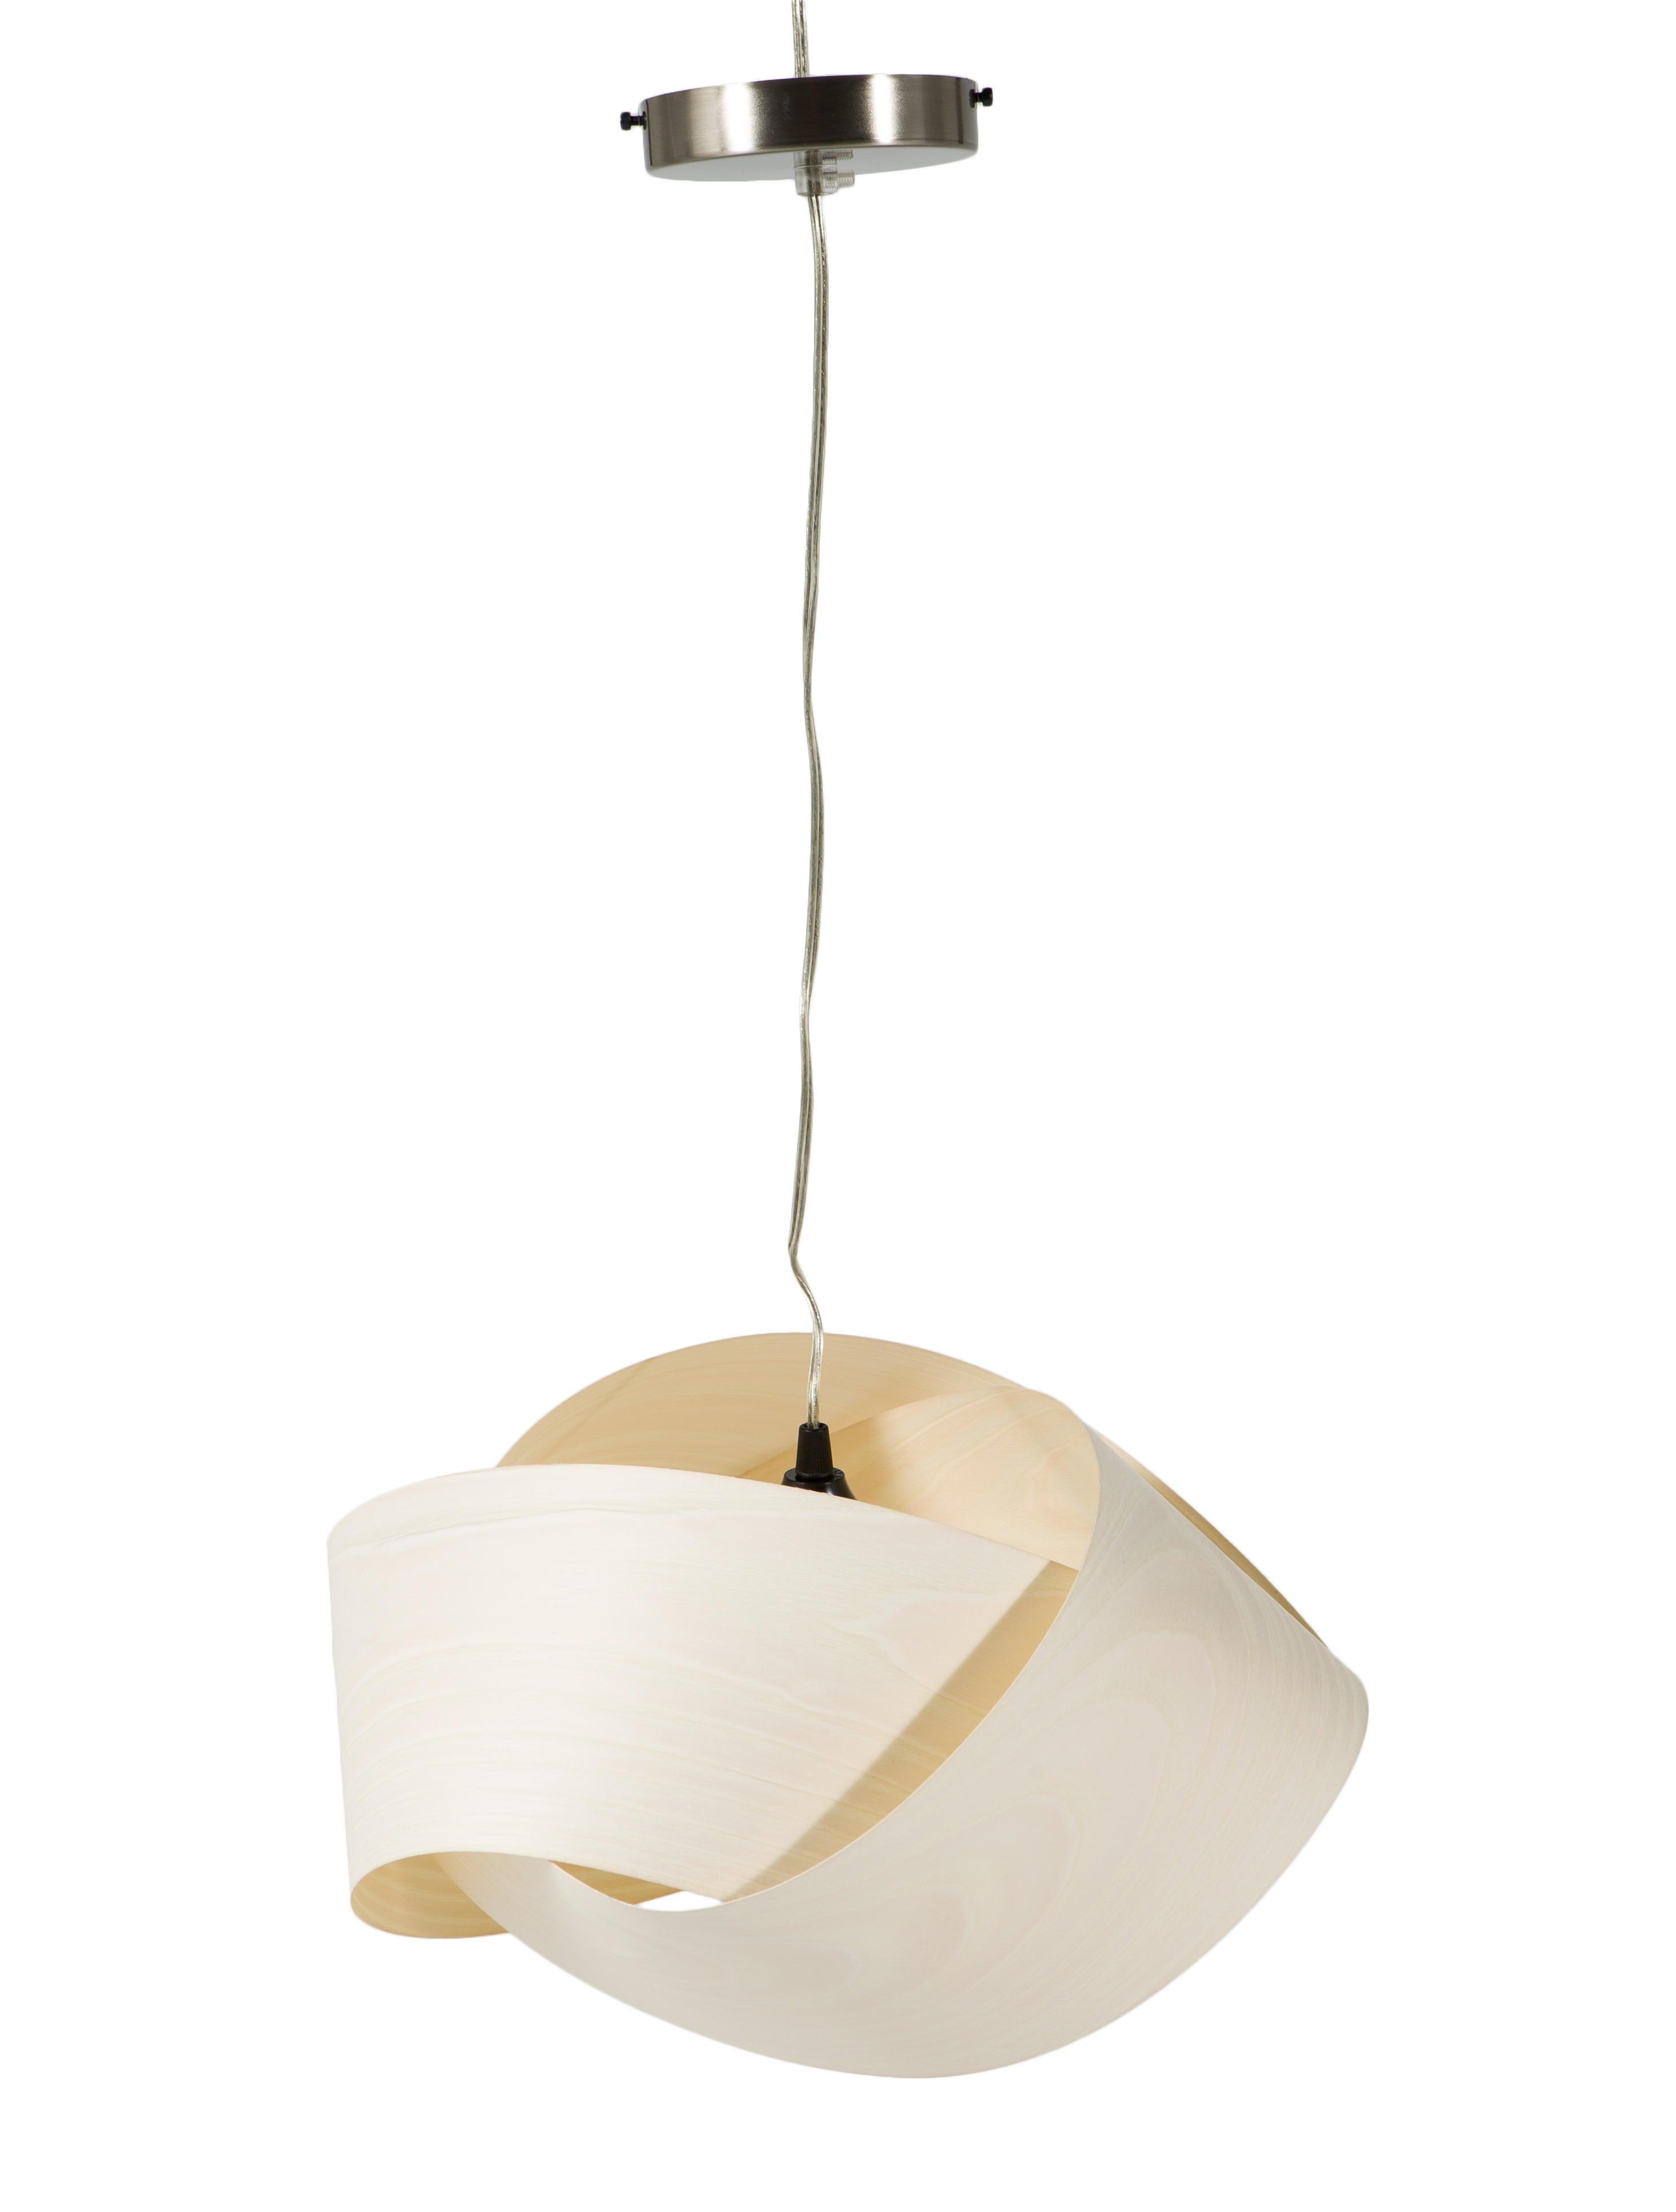 Luzifer nut pendant lamp lighting light20042 the realreal luzifer nut pendant lamp aloadofball Gallery